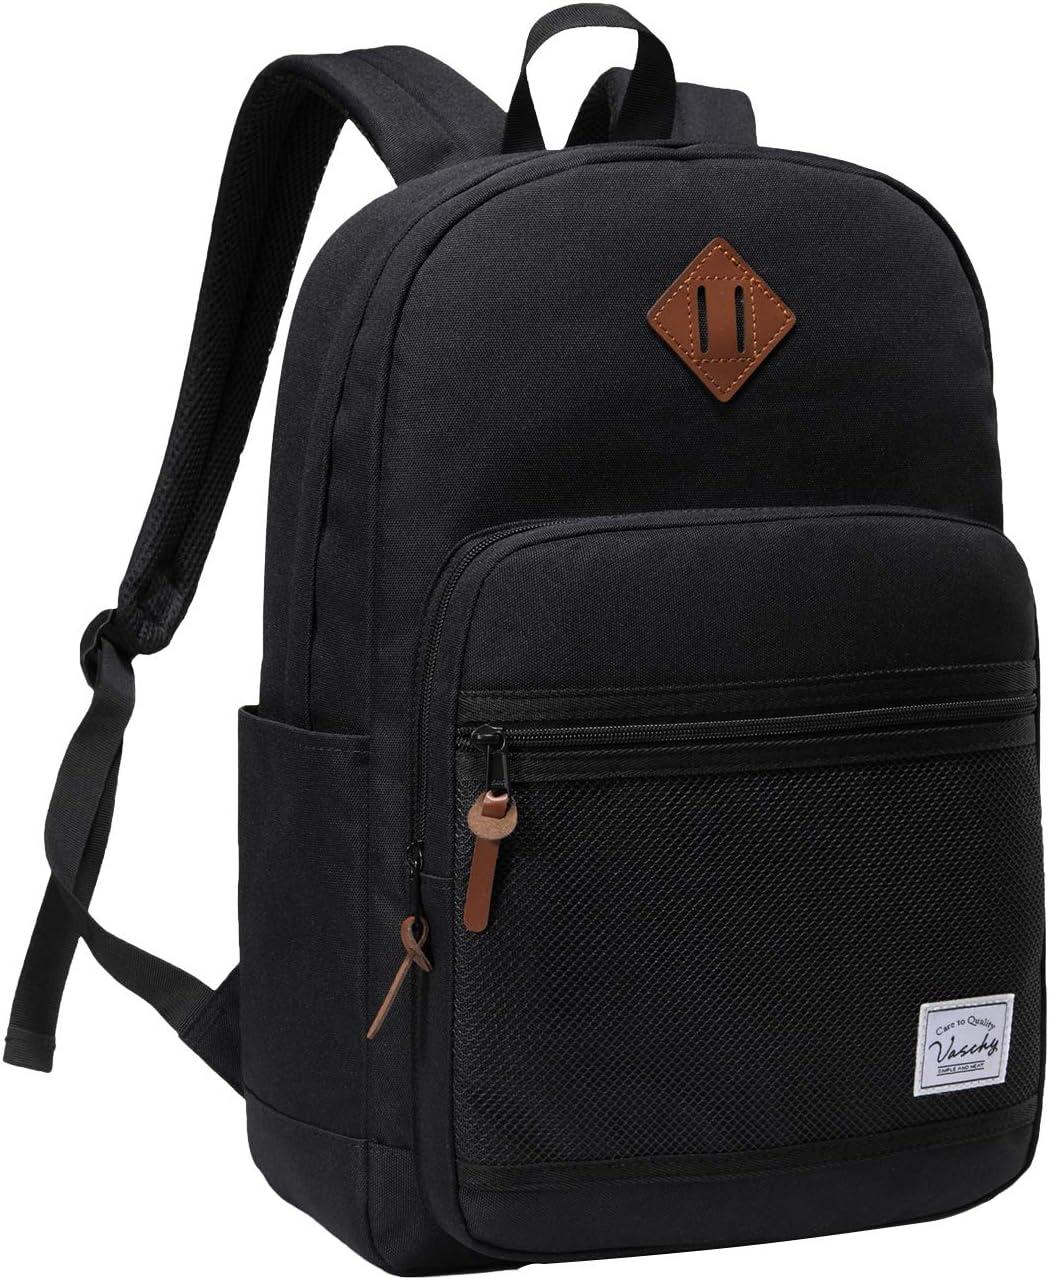 Max 68% OFF School Backpack VASCHY Water Casual Backpa Resistant Popular popular Lightweight